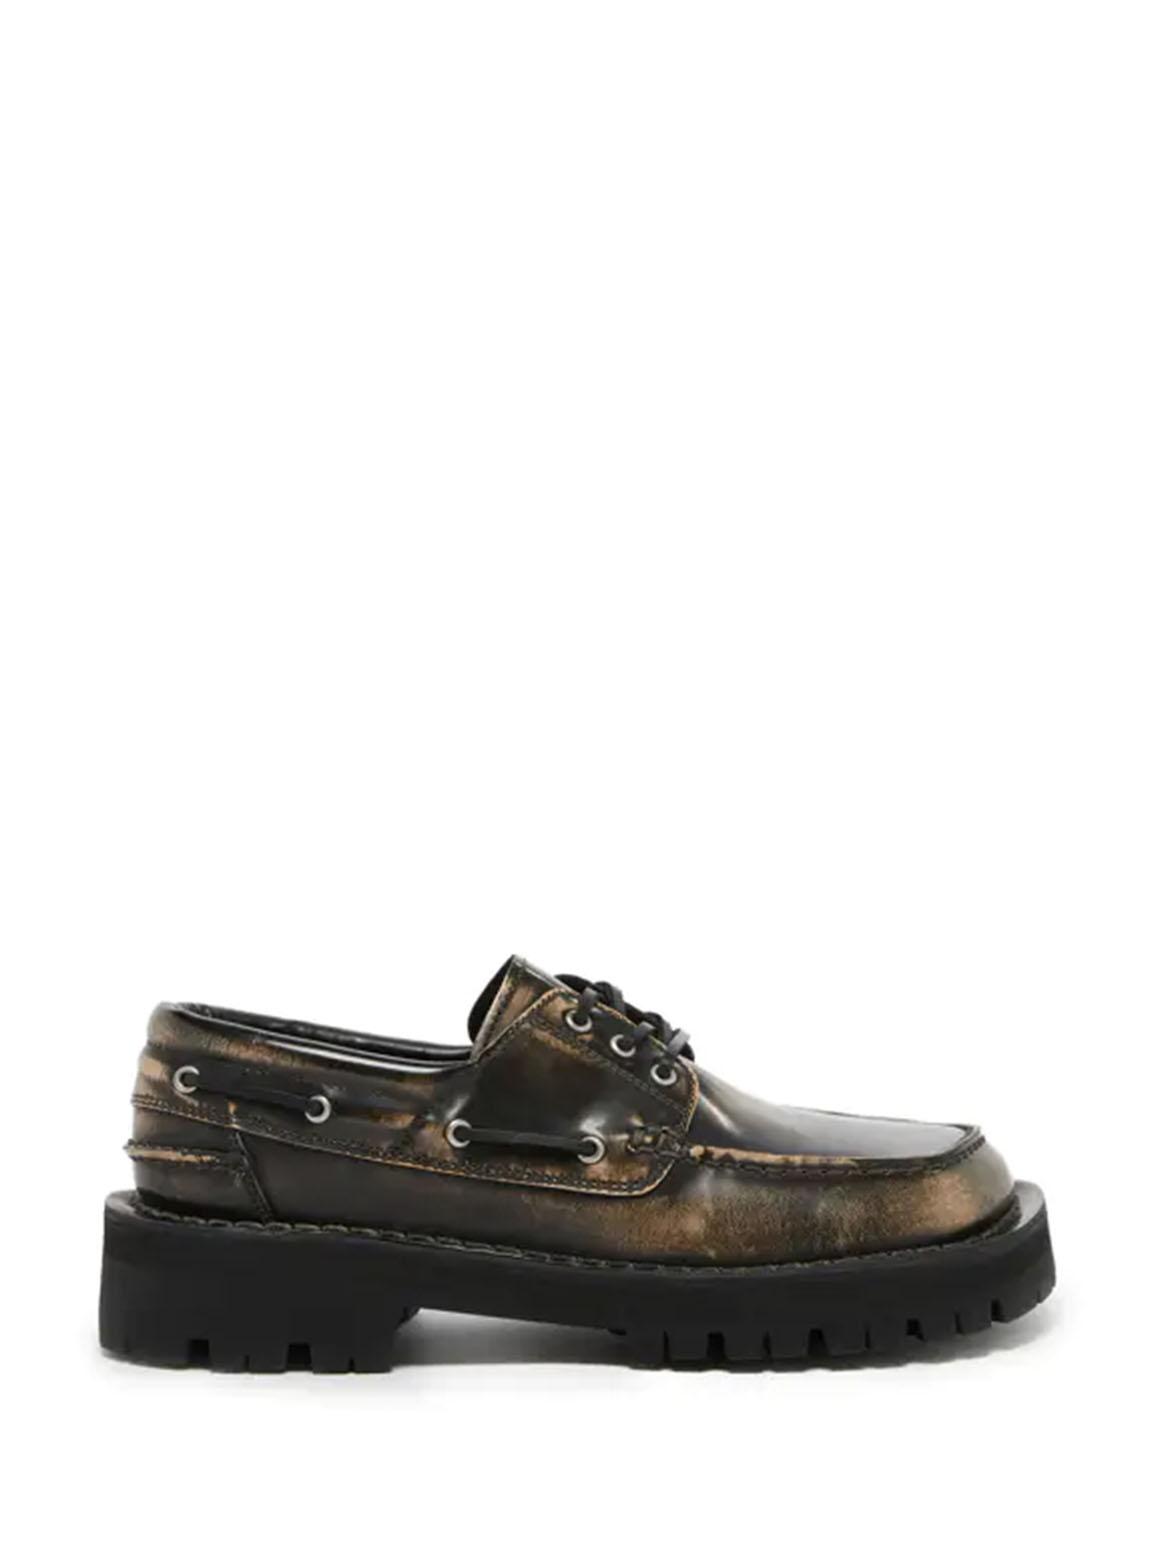 Eki shoes